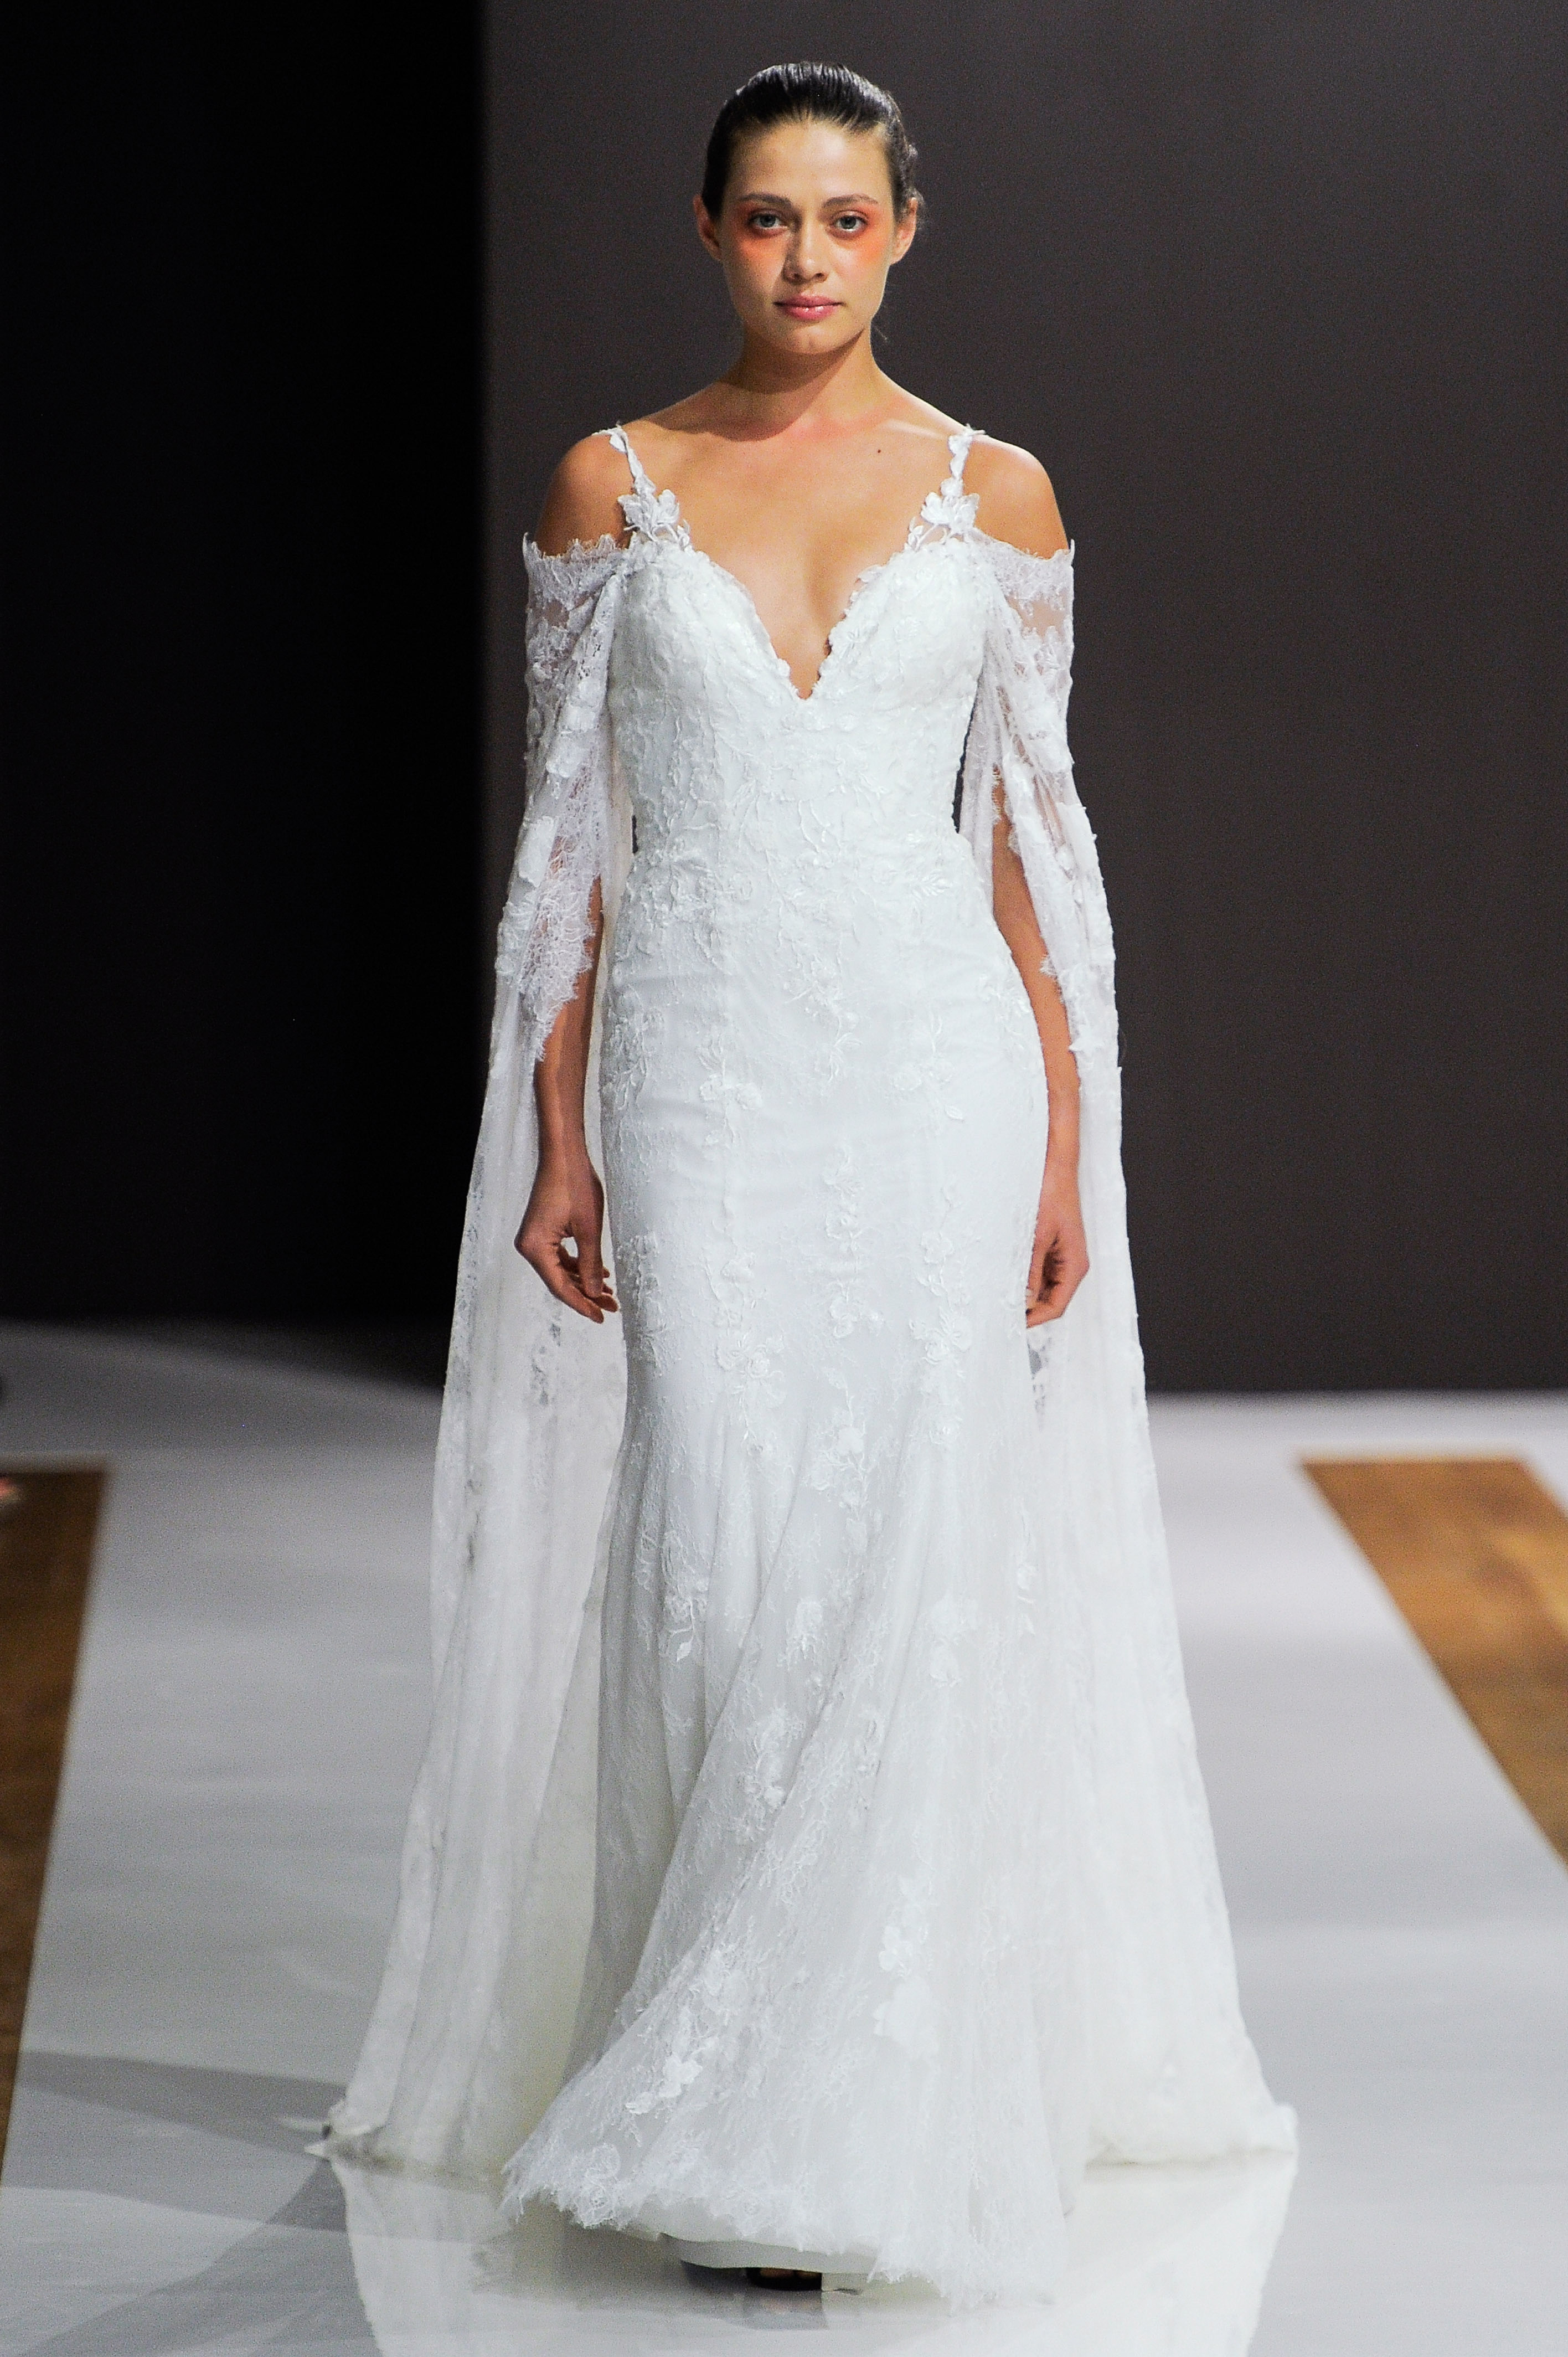 mark zunino wedding dress fall 2018 off the shoulder spaghetti strap lace trumpet